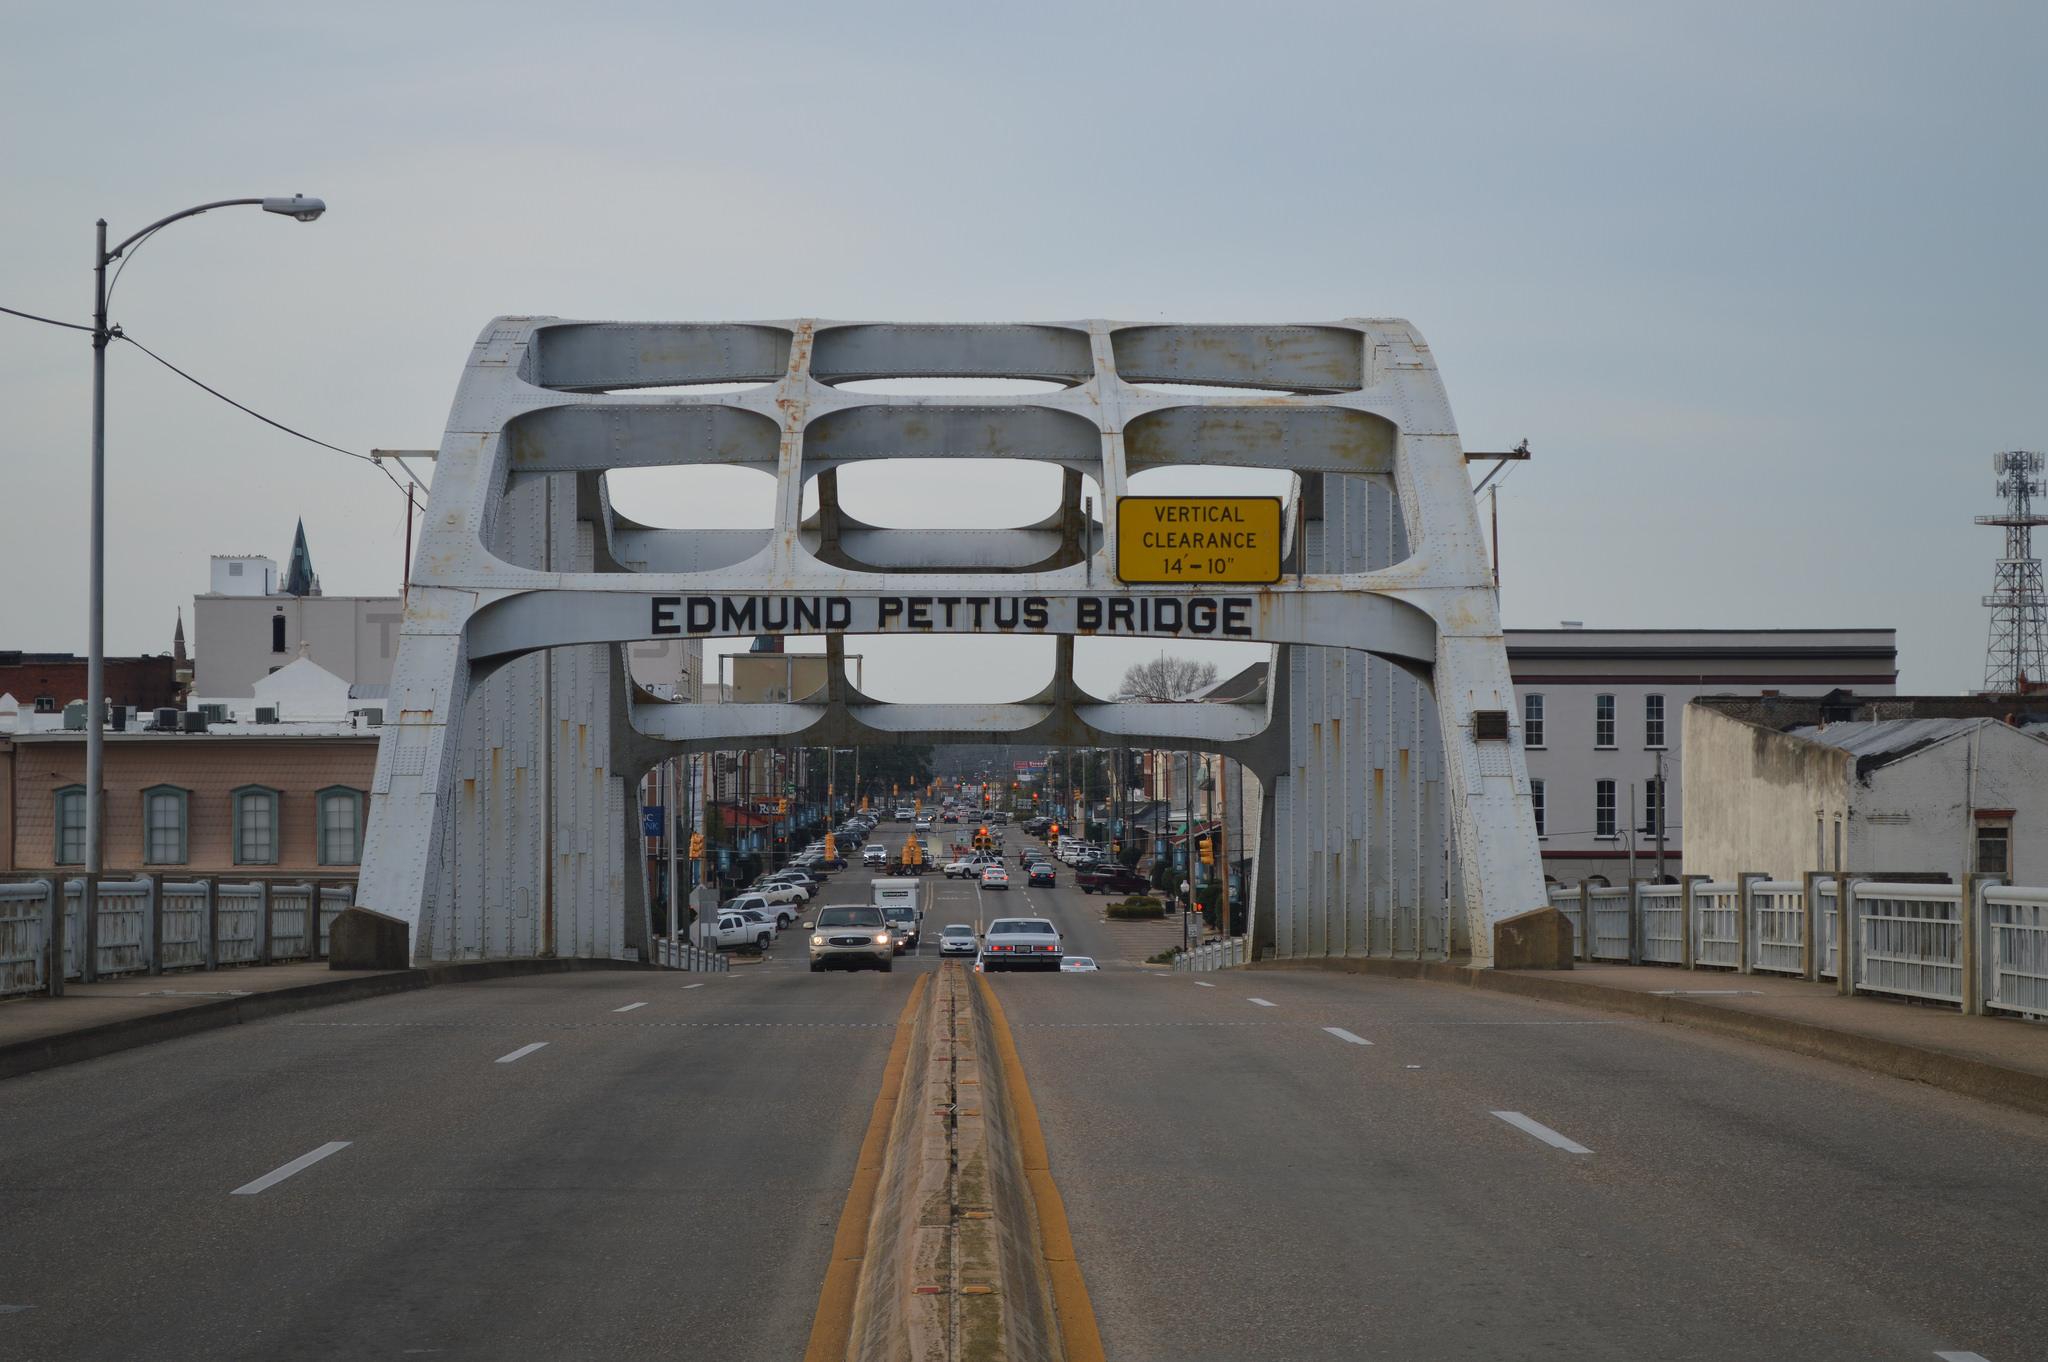 Copy of Edmund Pettus Bridge, Selma